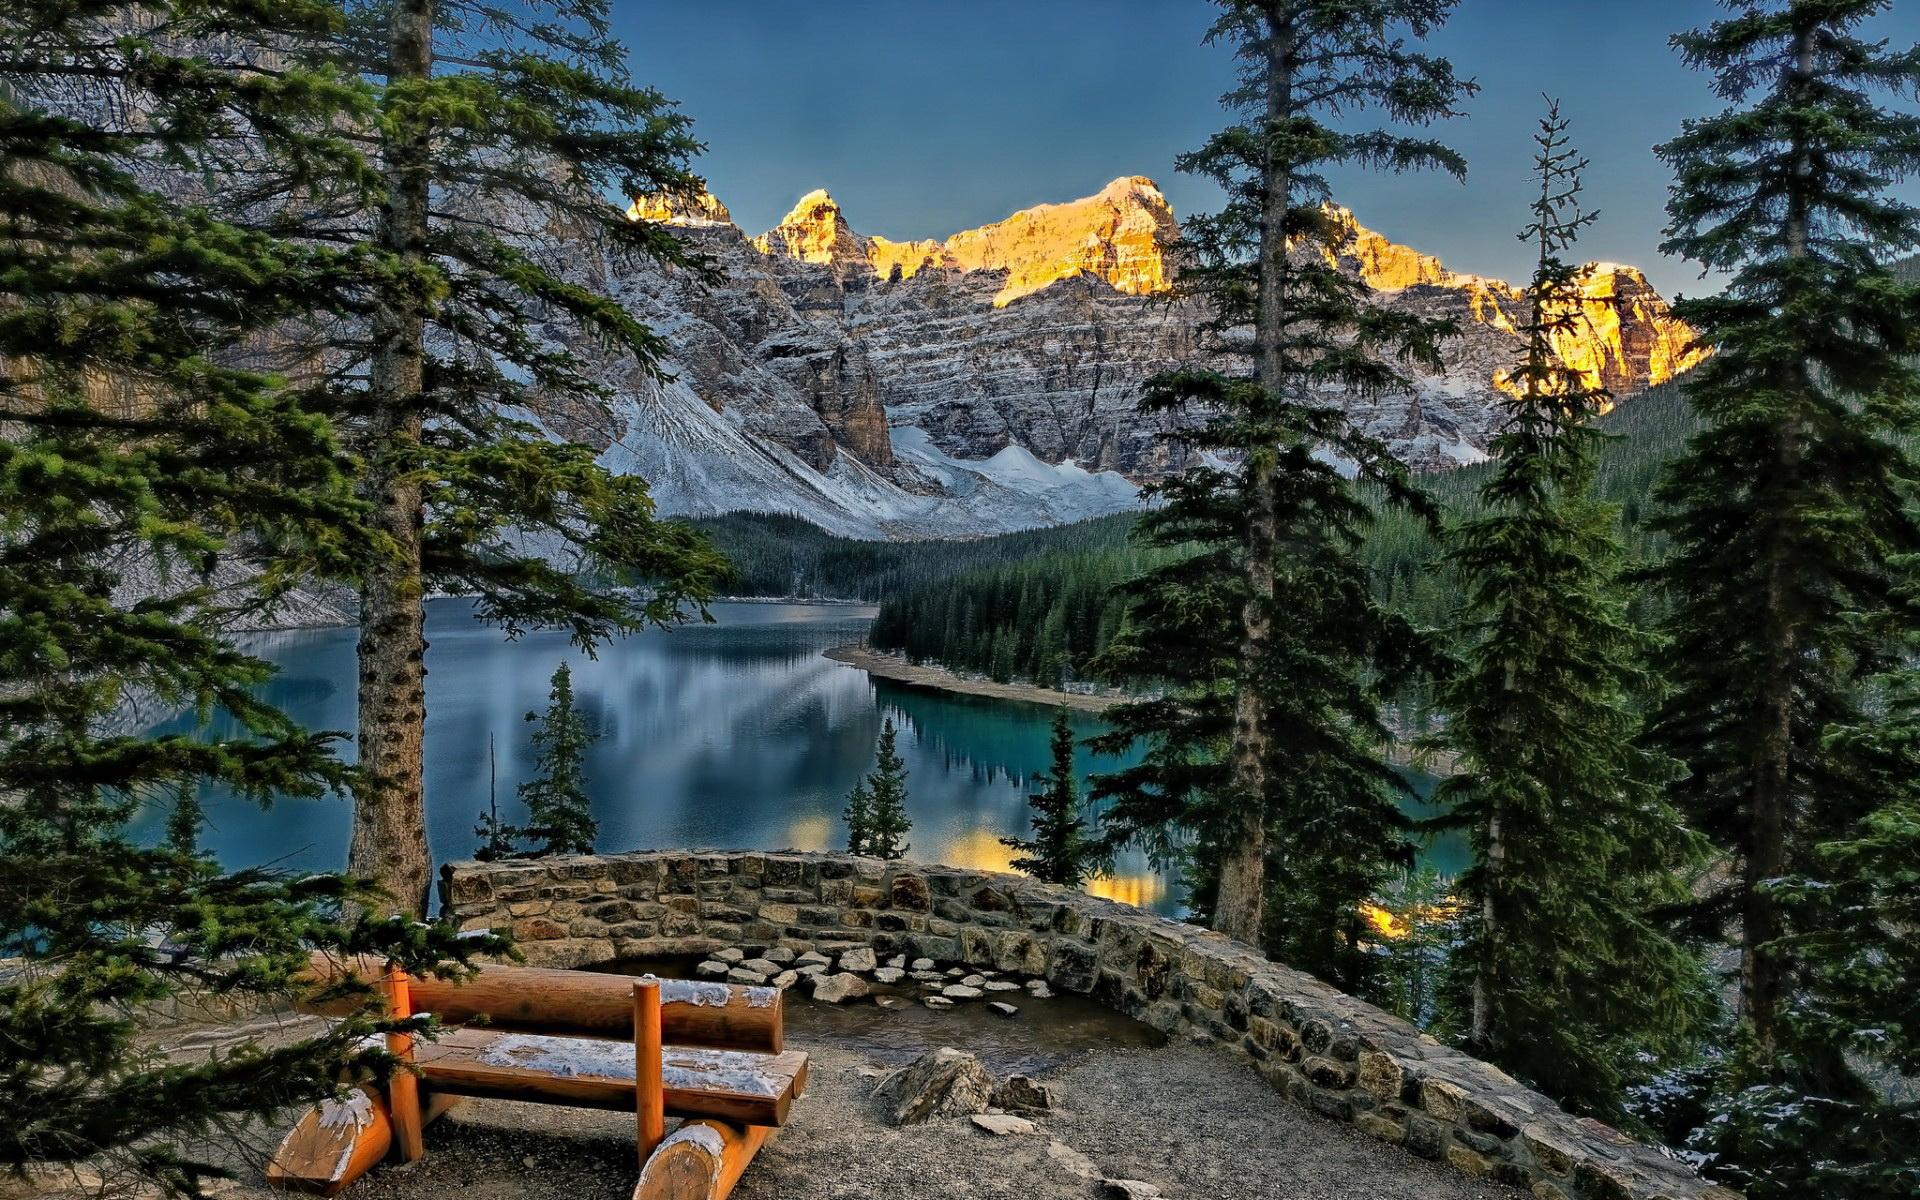 канада пейзаж обои на рабочий стол № 567375 без смс